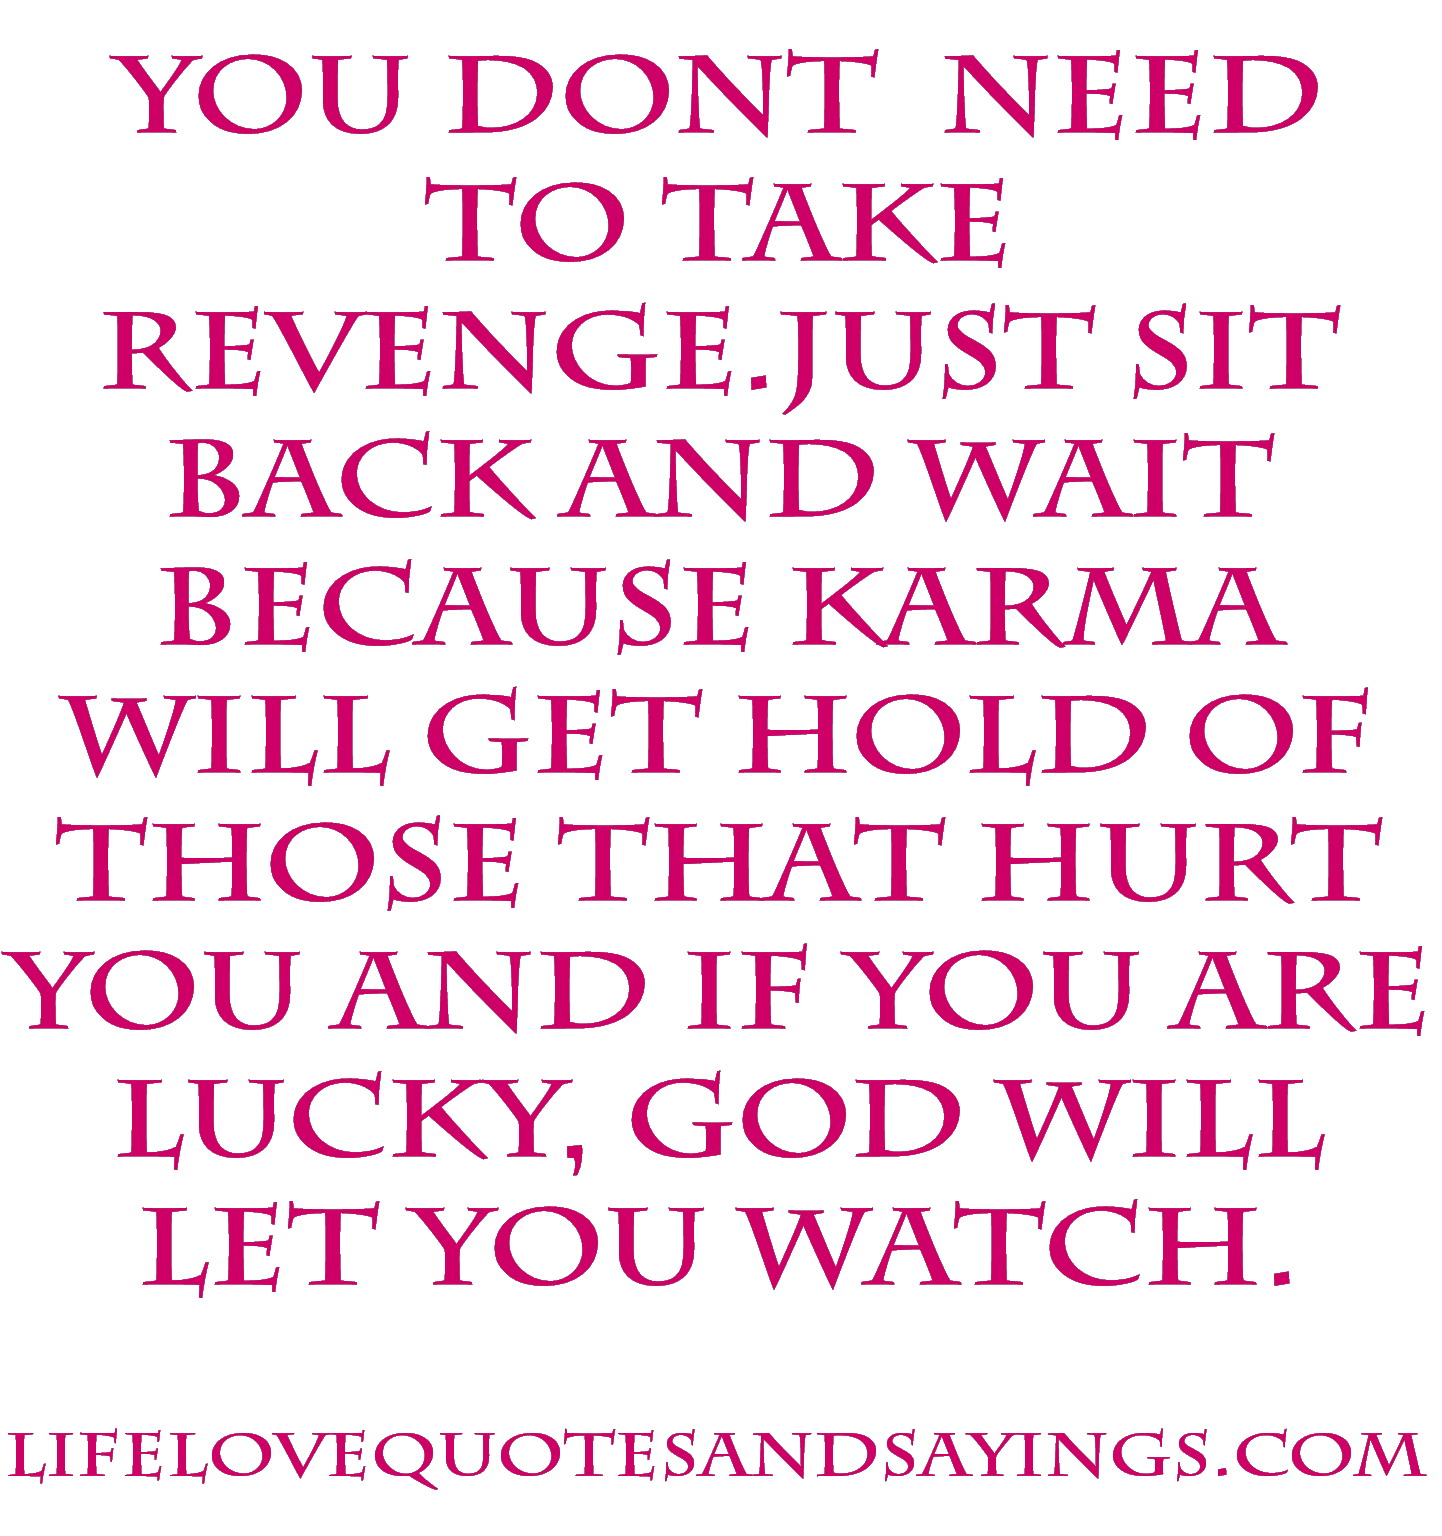 Buddha Quotes On Karma 2 Quotes Links